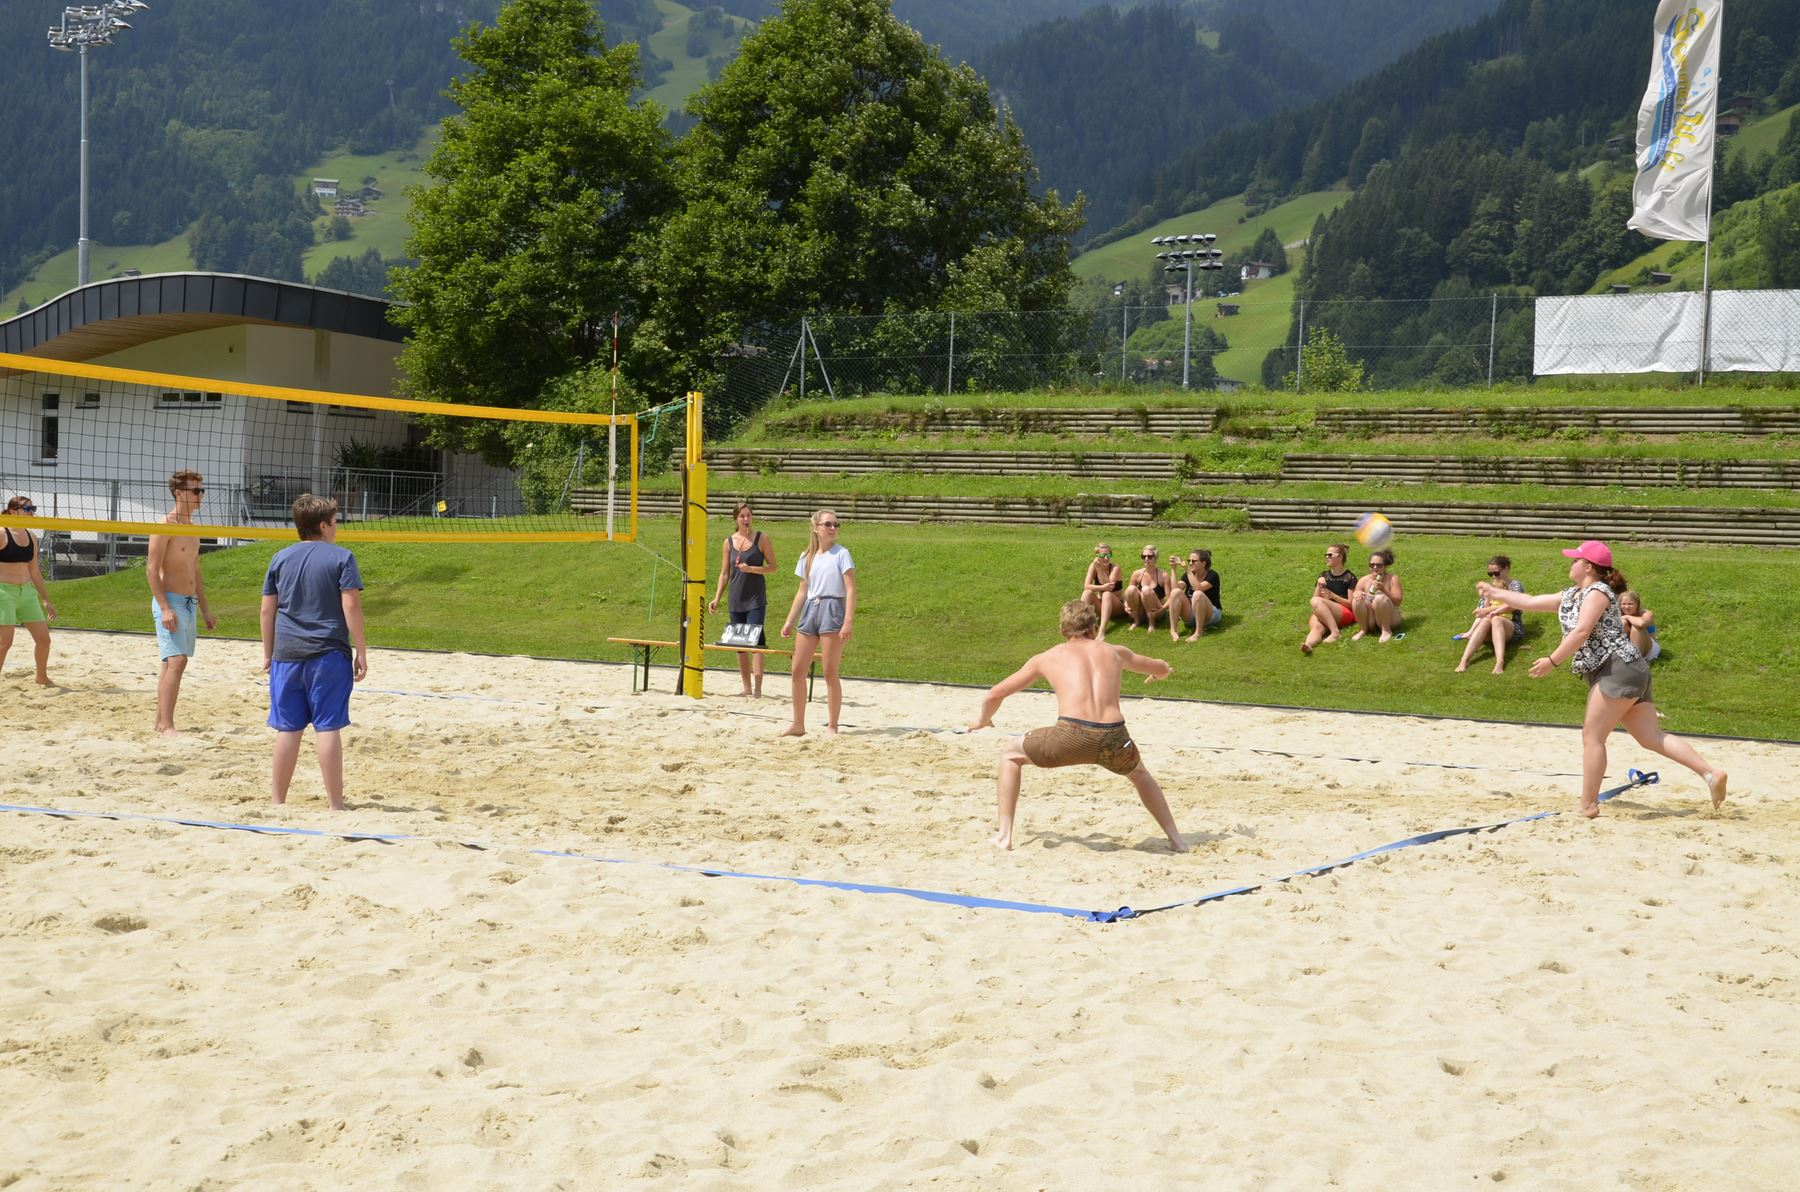 2016-07-02 Beachvolleyball 039